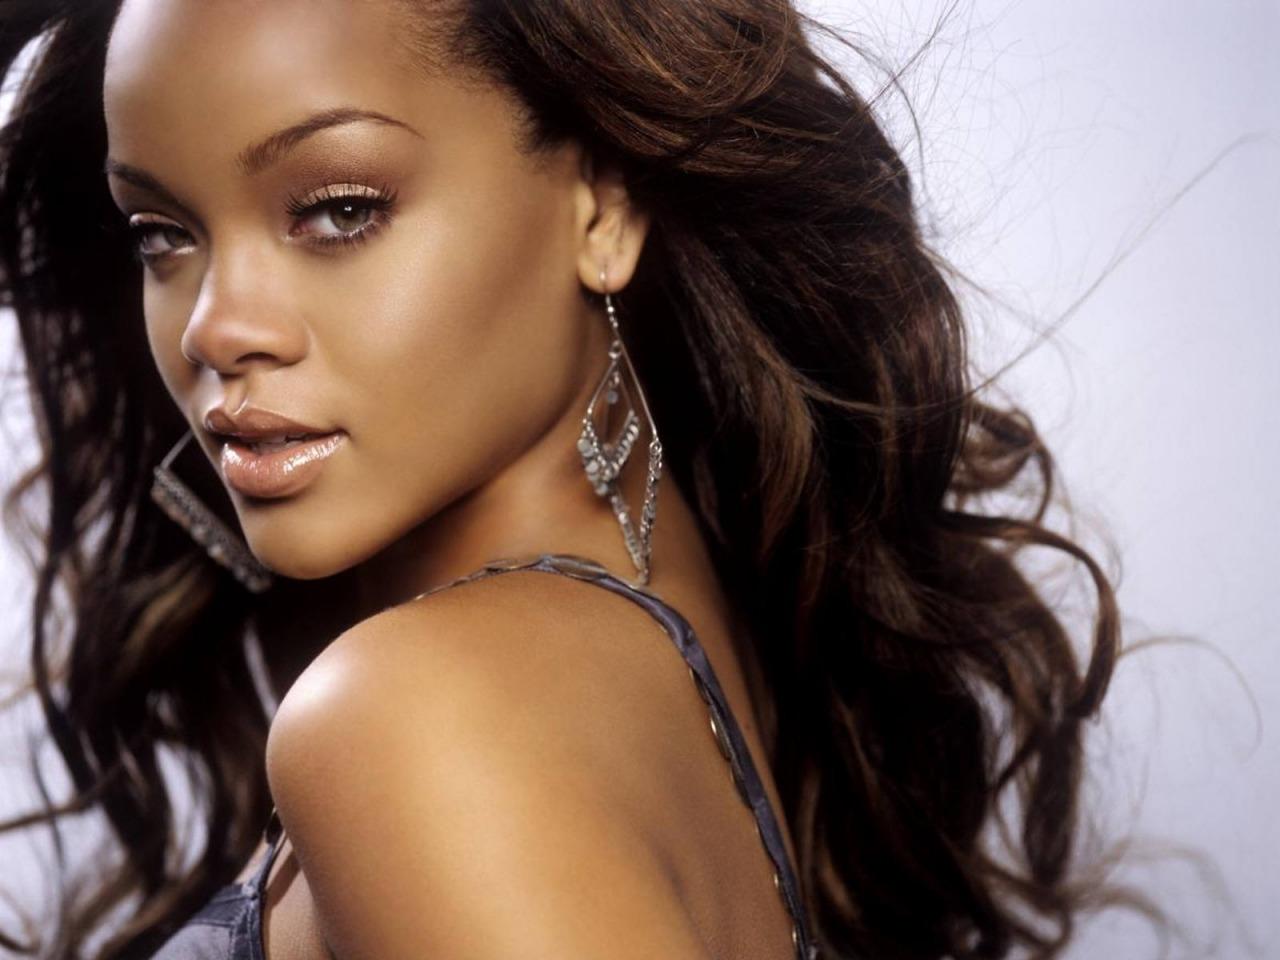 http://1.bp.blogspot.com/-XTNvy2p07y8/TjIQJCaSvWI/AAAAAAAABZY/YYp9pvurz9g/s1600/Celebrities+SeasonalColorAnalysis+Rihanna.png